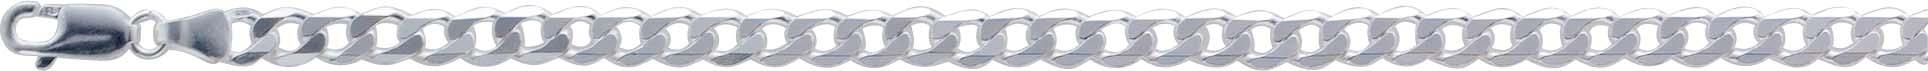 UNO A ERRE Panzerkette Panzerarmband Herrenkette Herrenarmband Silberkette 925 Halskette 925 5mm 70 256477170